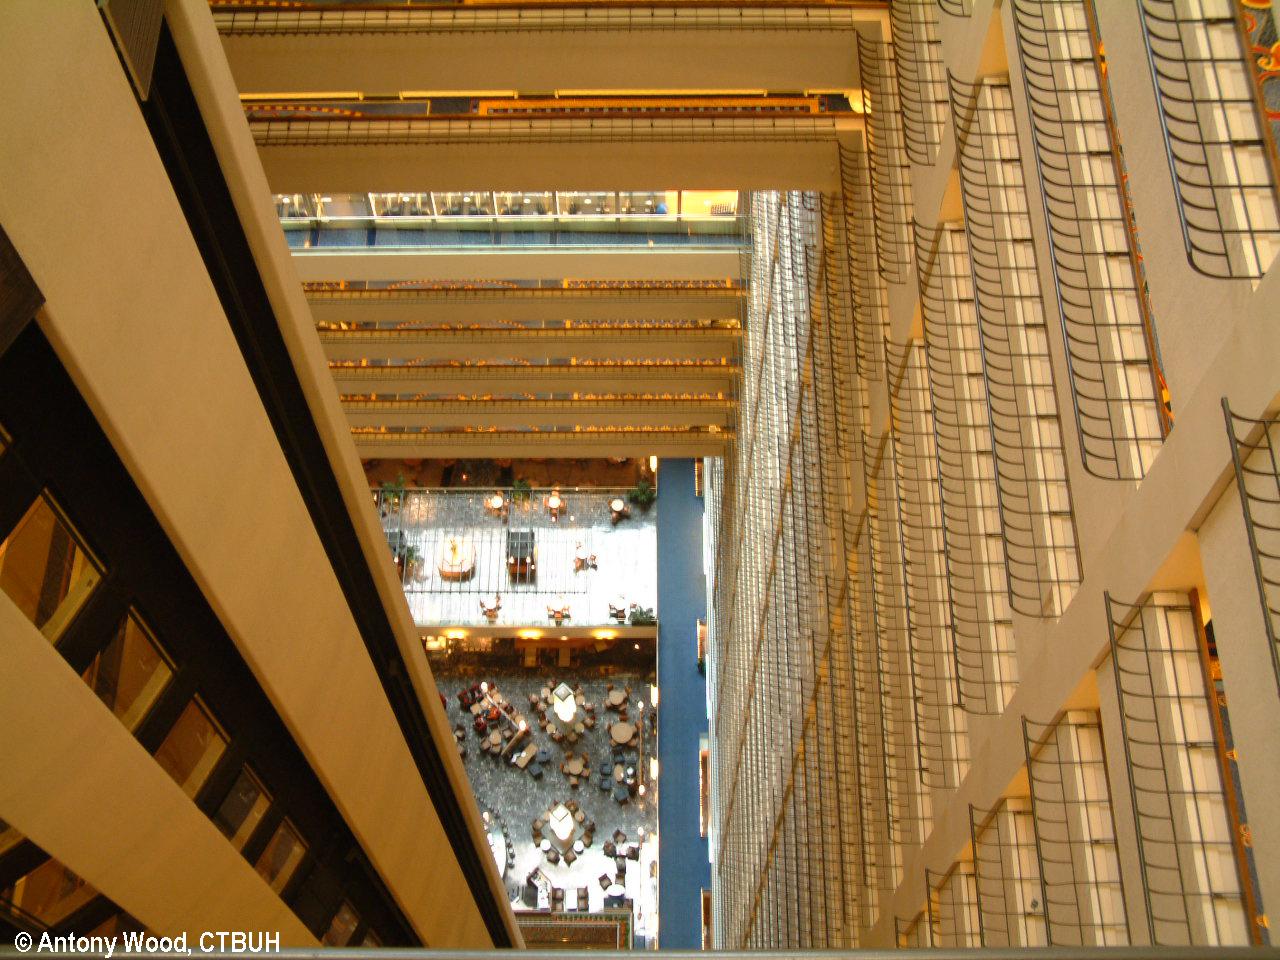 meilleure sélection 1f244 7ce21 New York Marriott Marquis Hotel - The Skyscraper Center